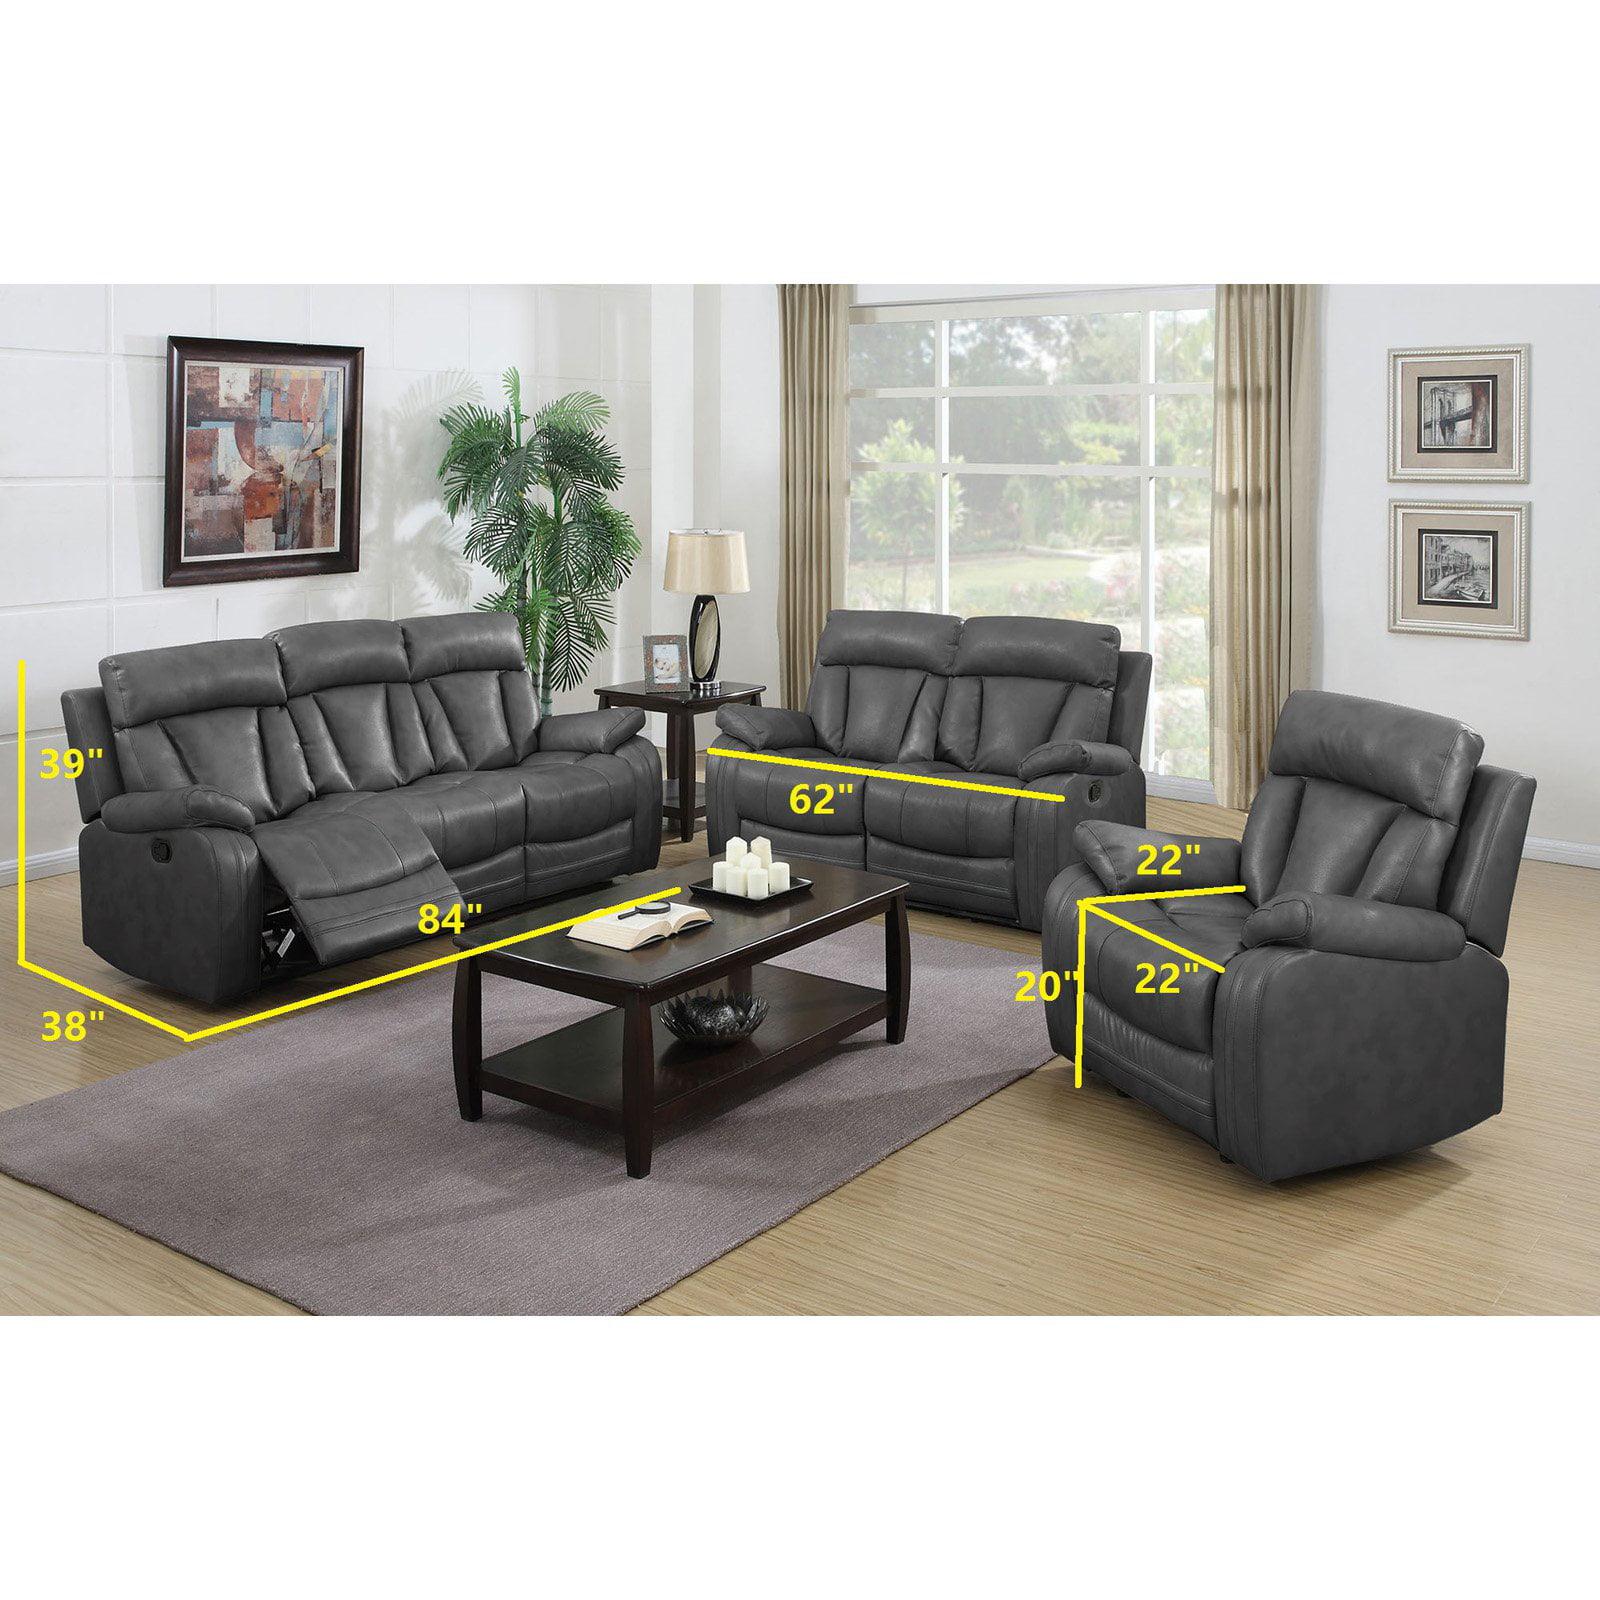 NH Designs 72004B Gray Bonded Leather Sofa Recliner & Loveseat Set